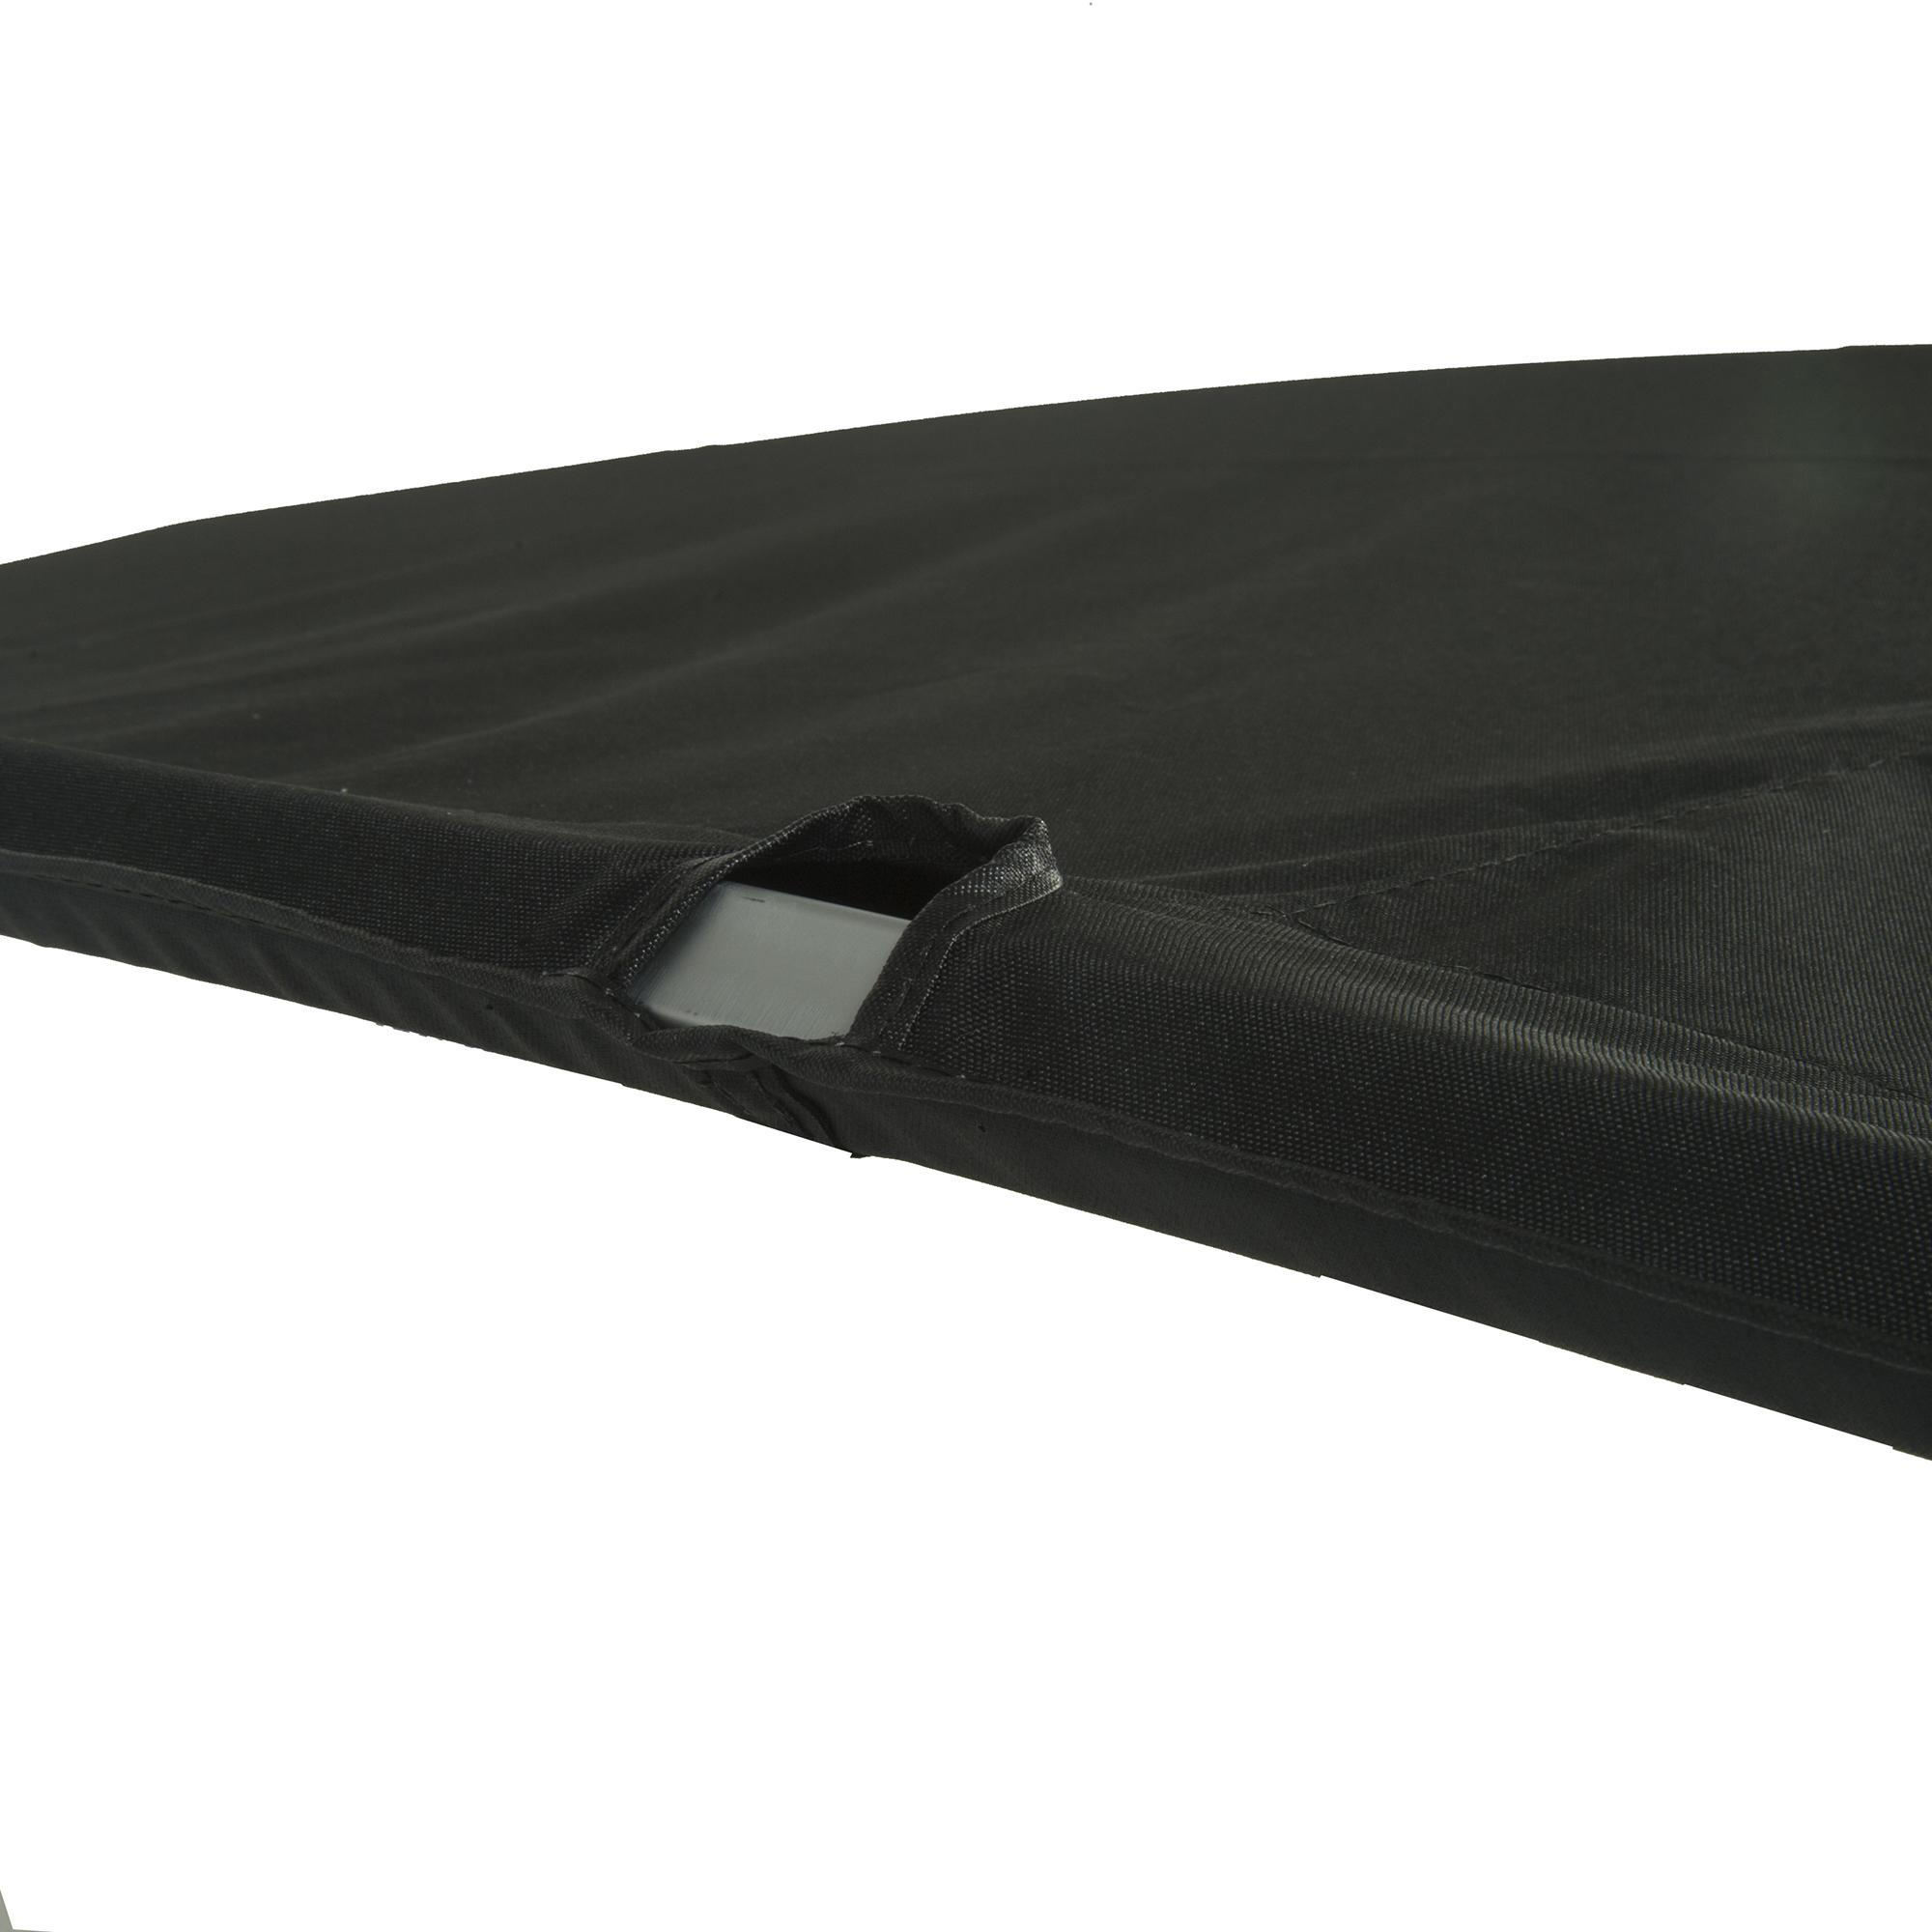 "Buggy Style Pontoon Bimini Top Sunbrella Acrylic, 1-1/4"" Free Standing 96""-102""W"